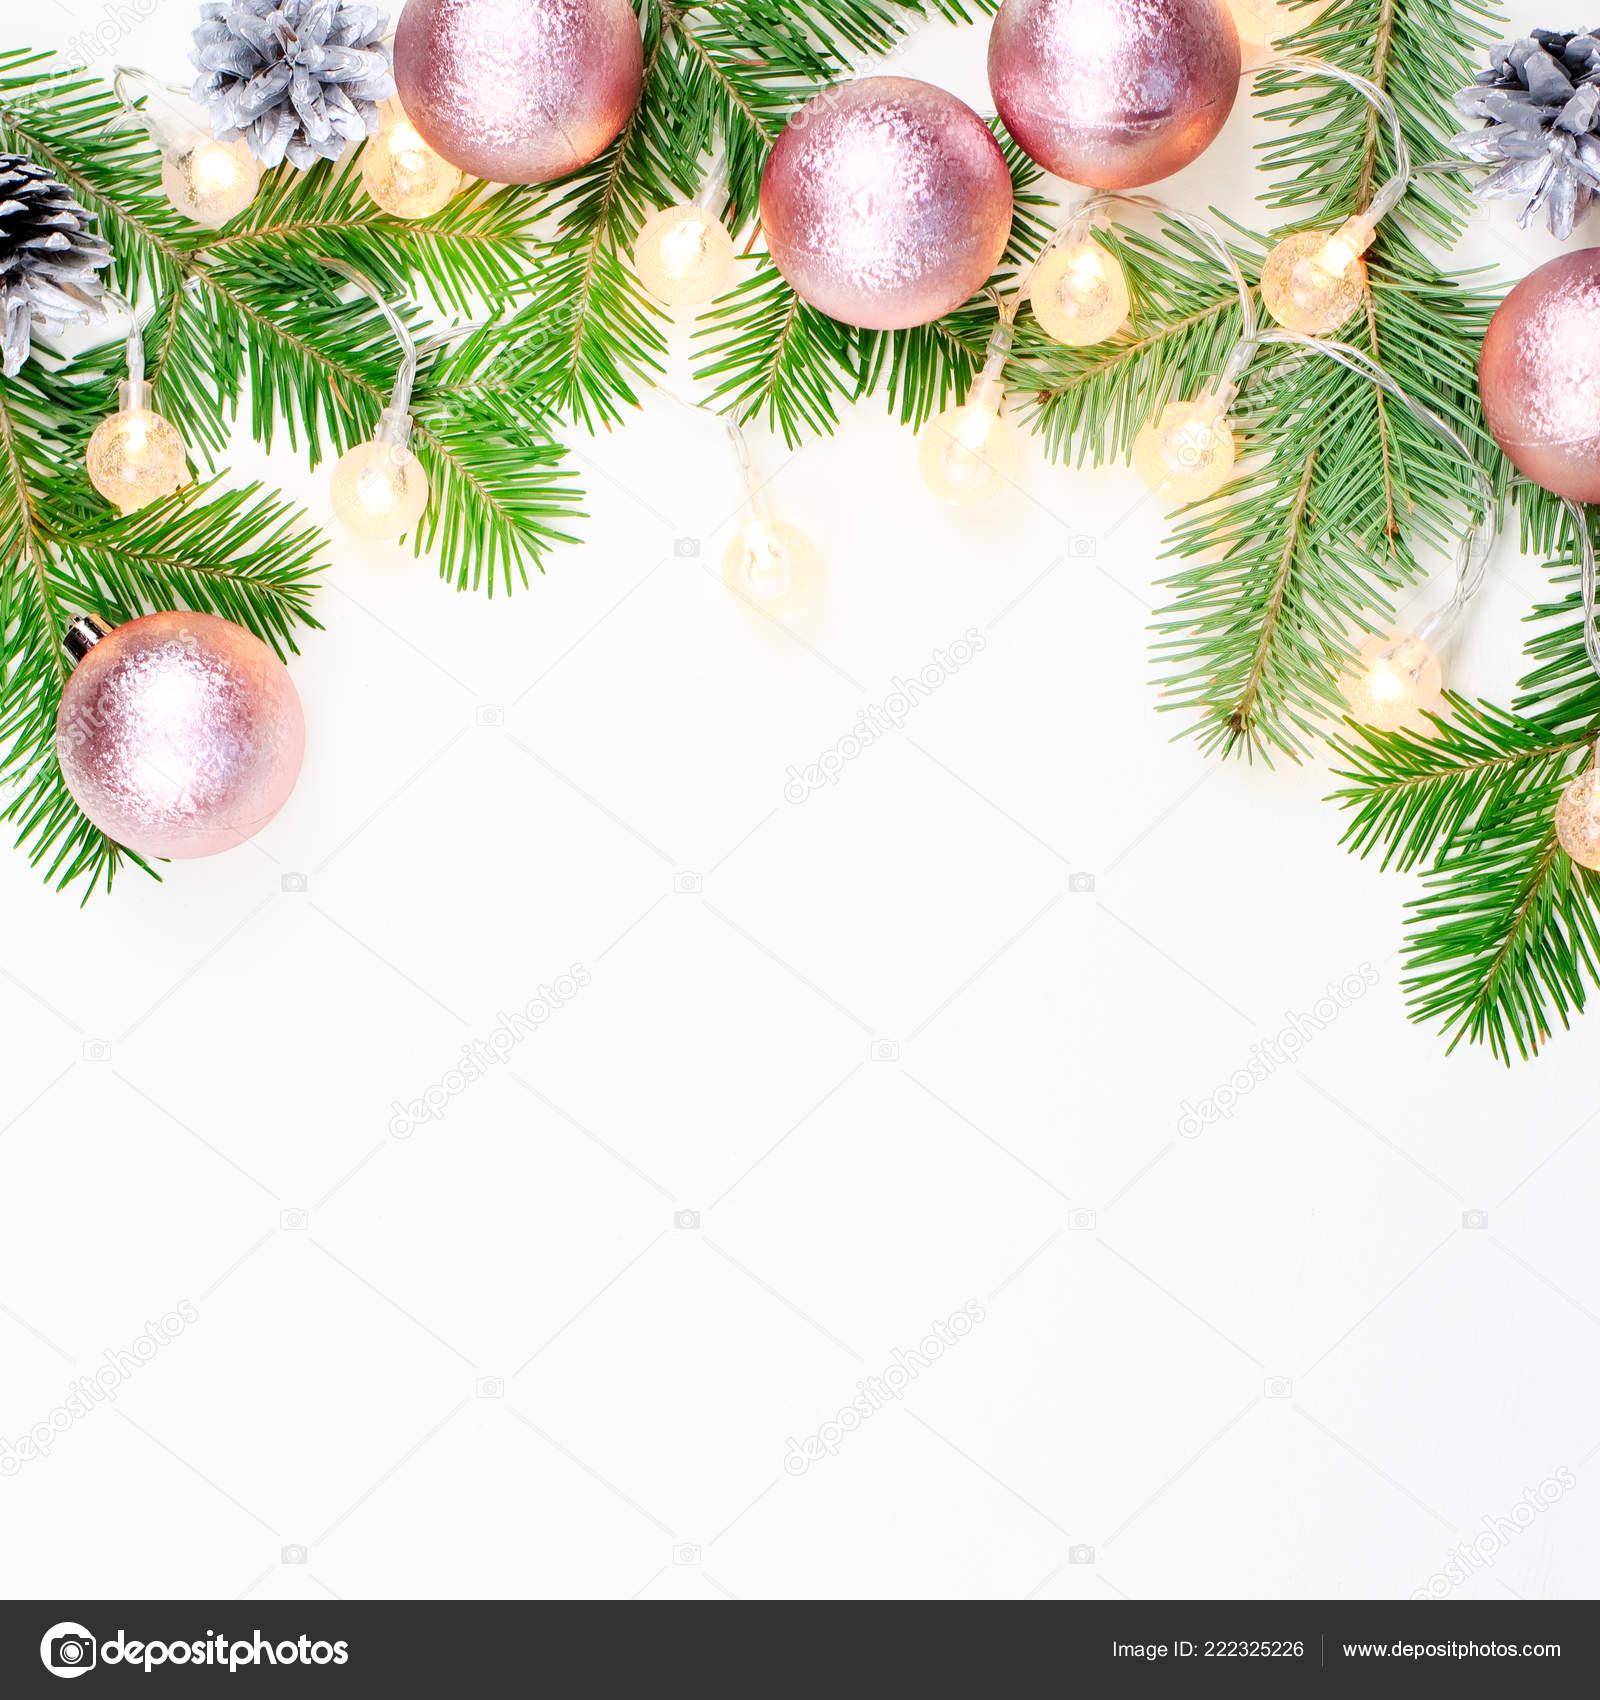 Branche D Arbre Sapin De Noel fond noël avec des branches arbres sapin décorations roses